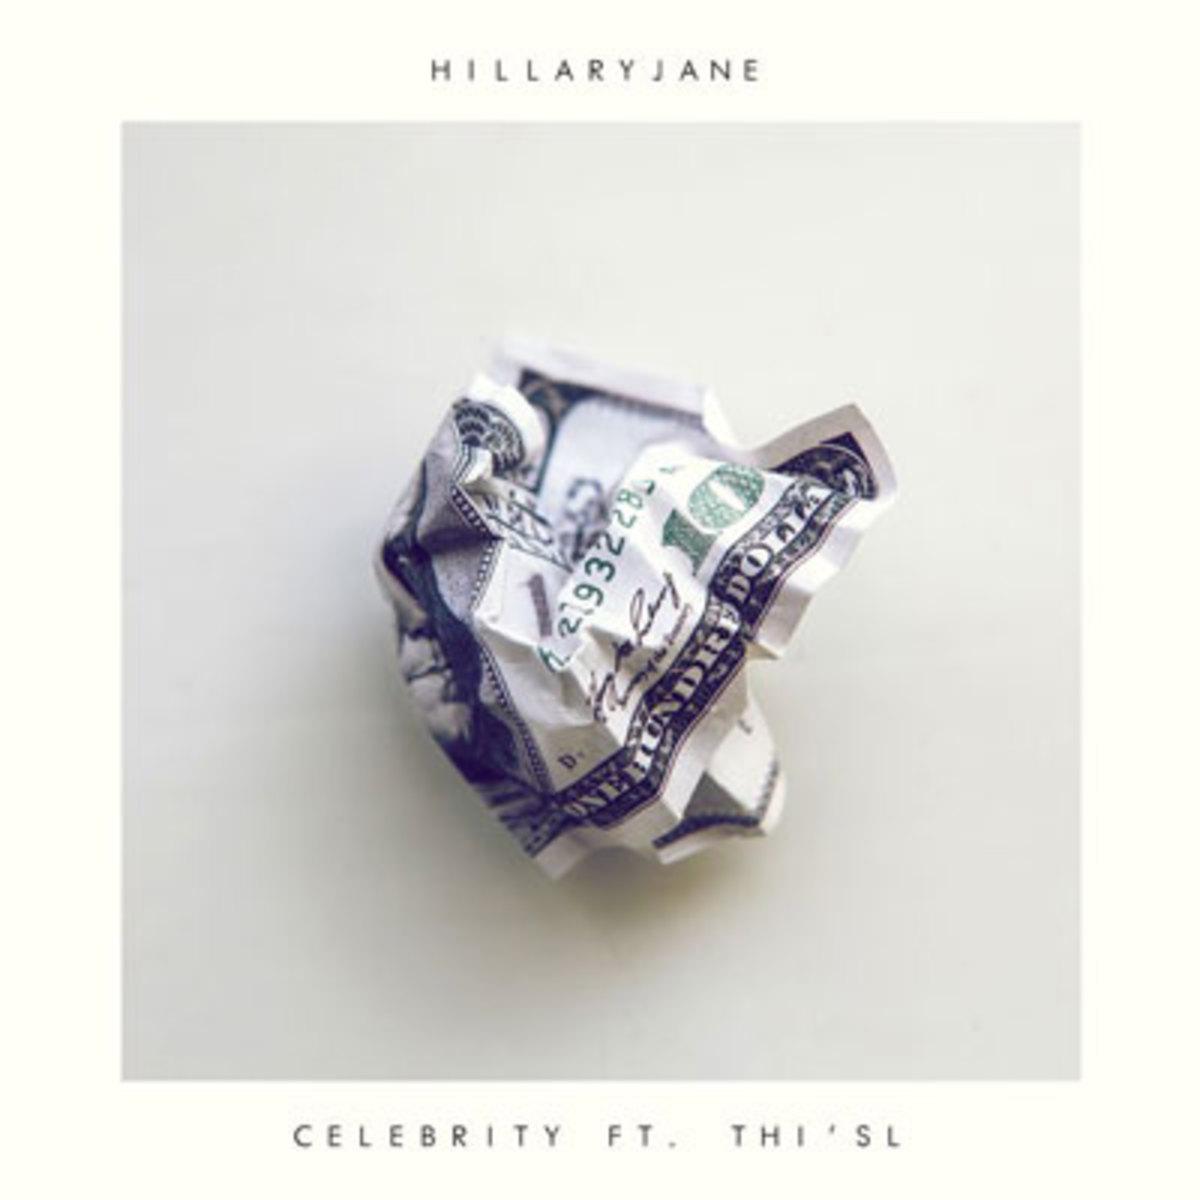 hillaryjane-celebrity.jpg